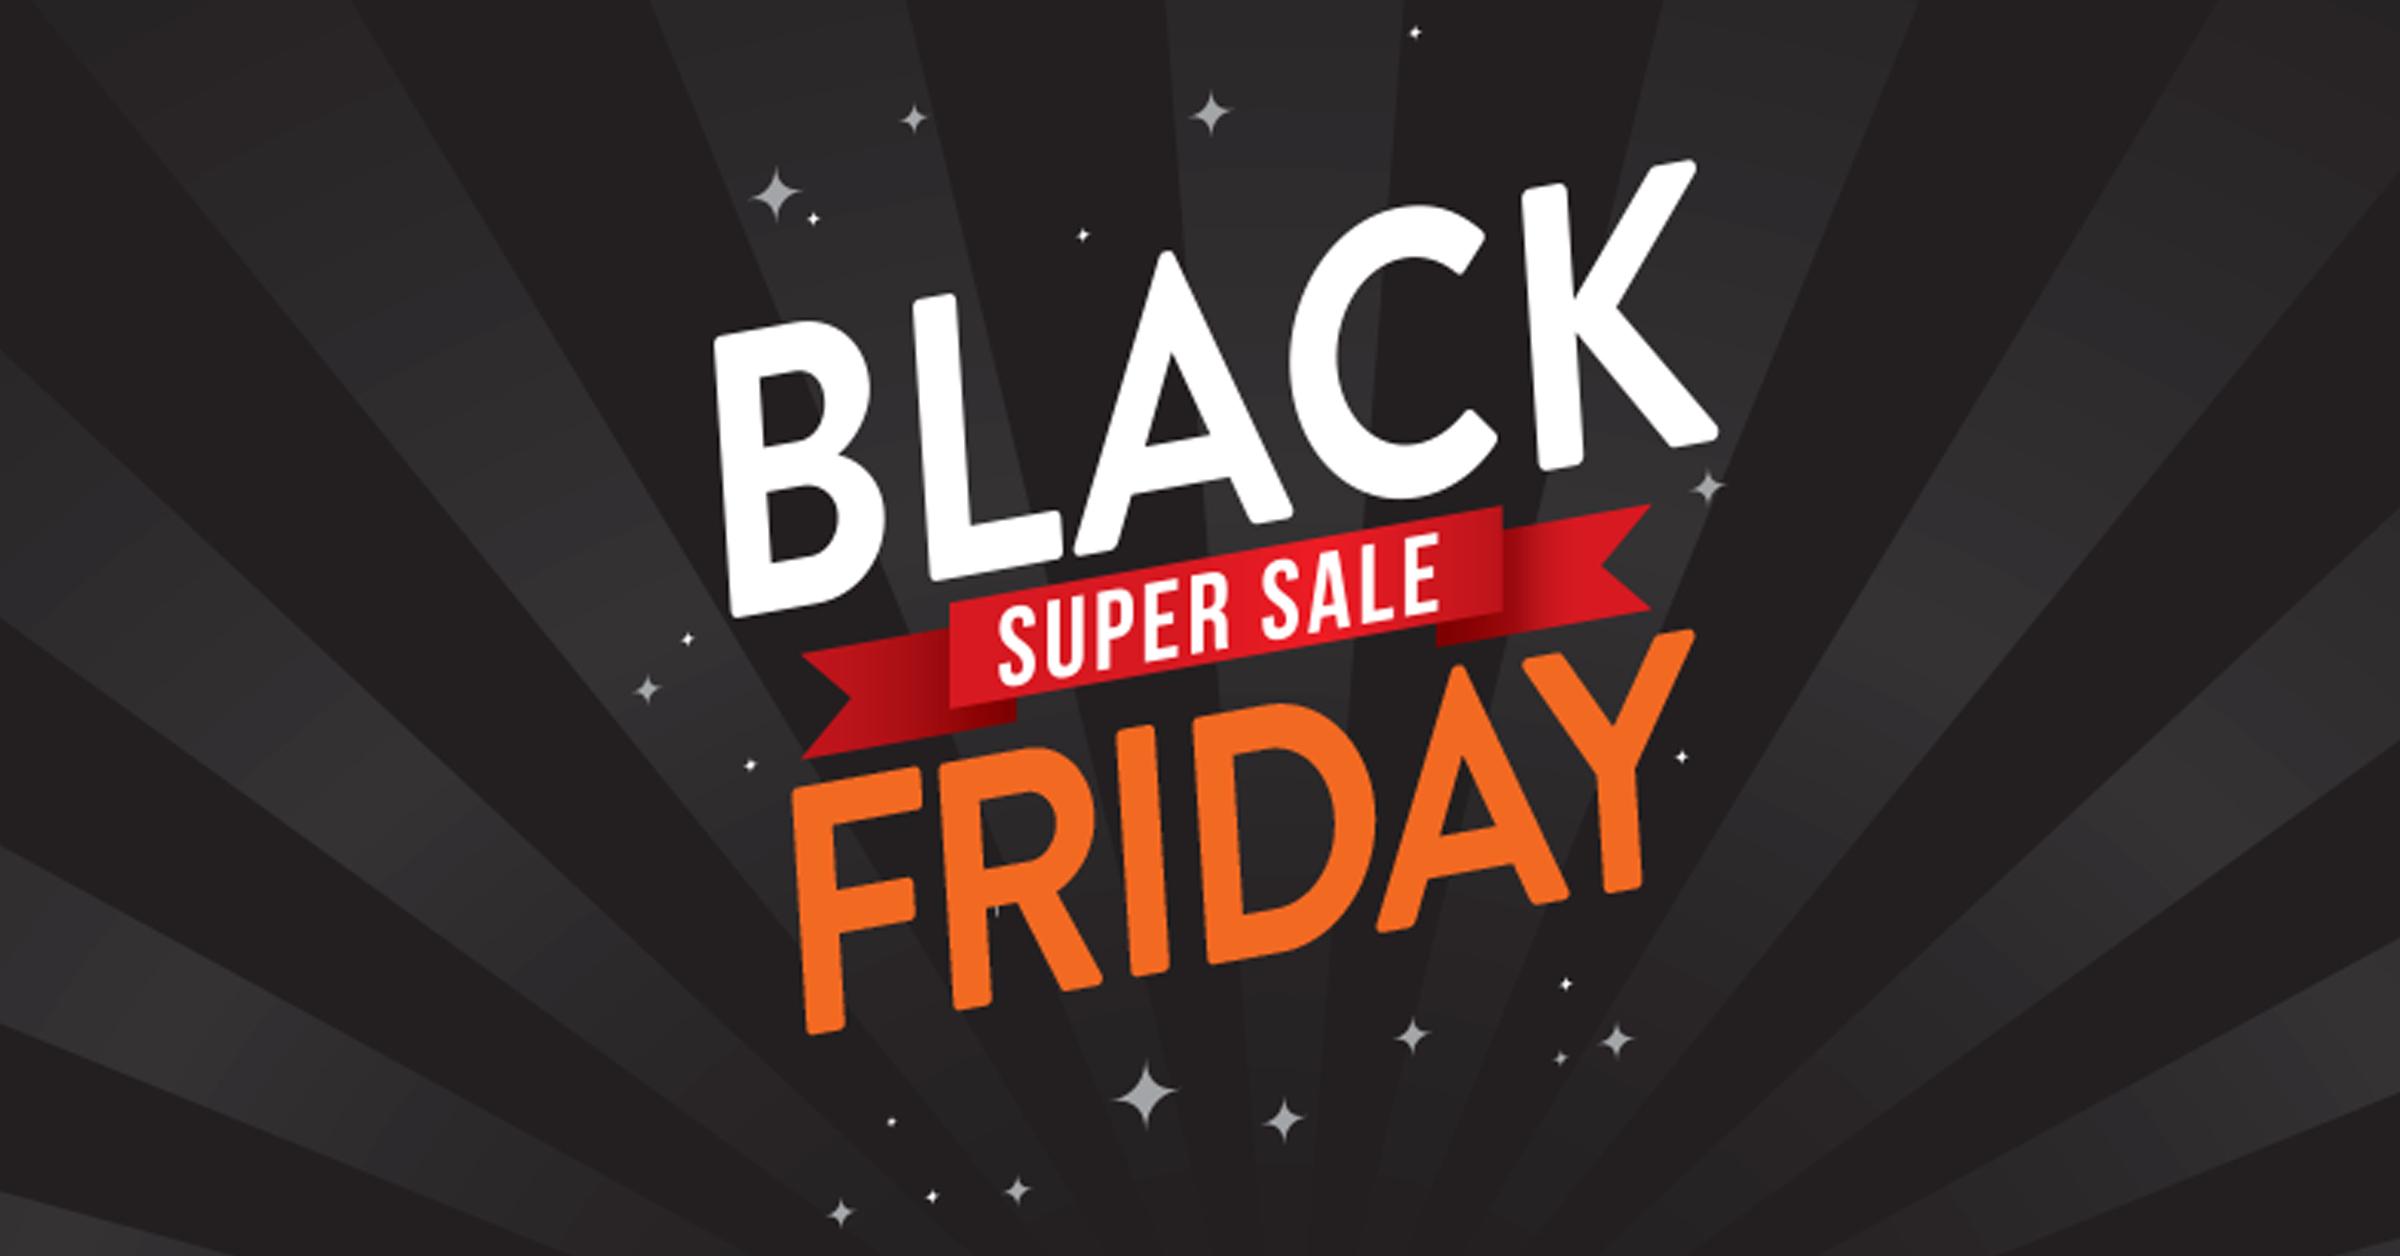 gpldownload black friday deals